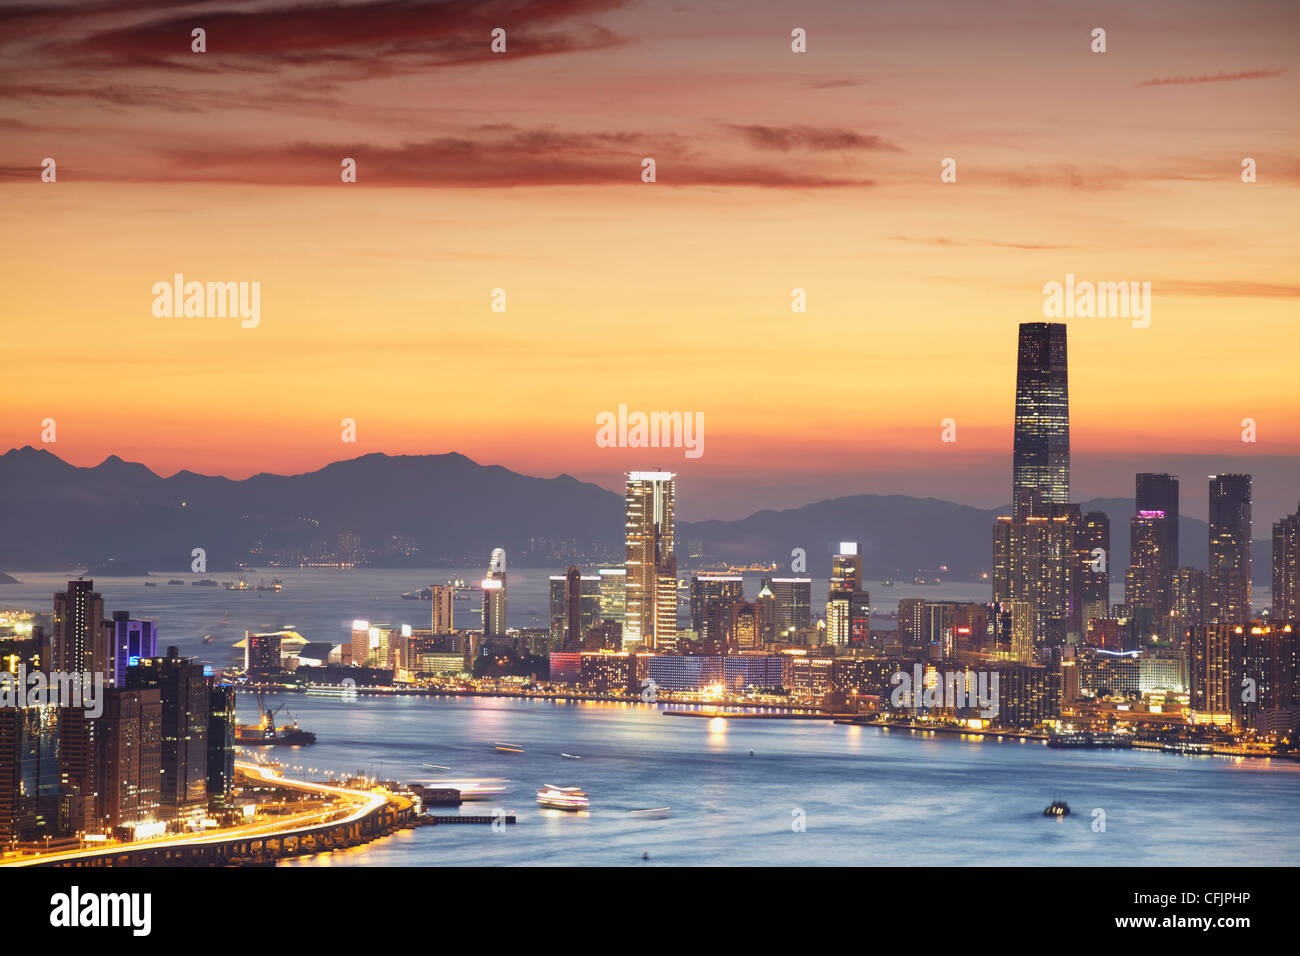 Tsim Sha Tsui skyline at sunset, Hong Kong, China, Asia - Stock Image